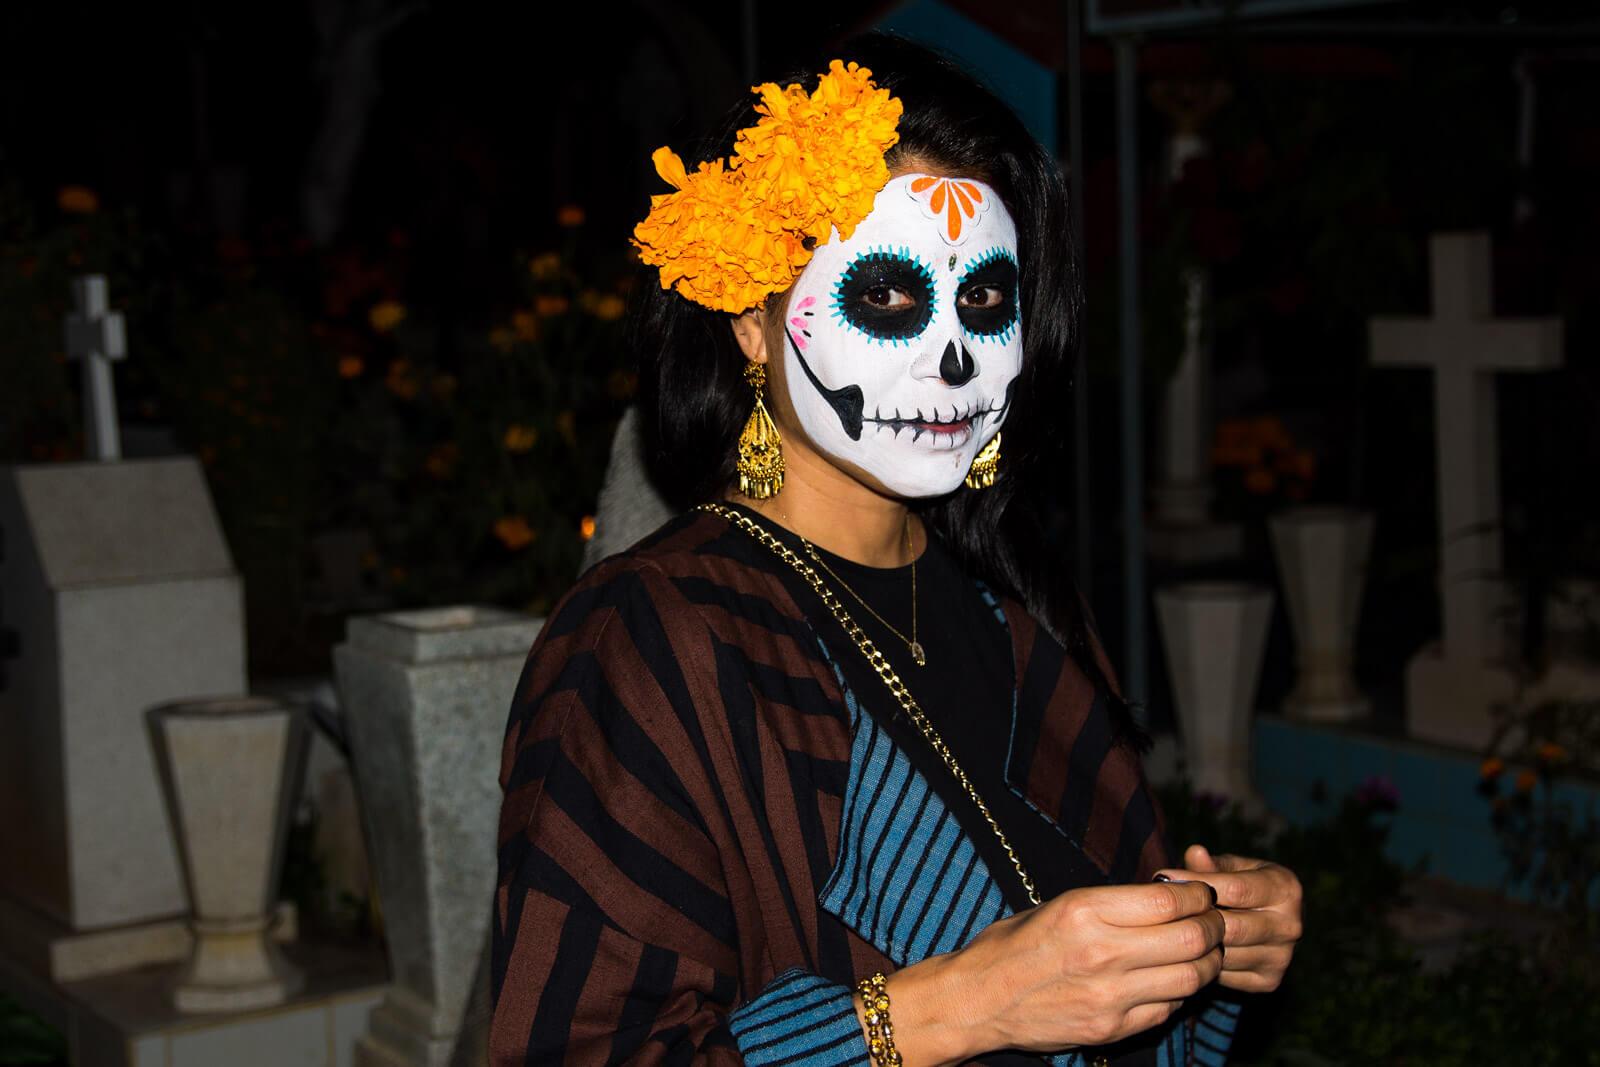 Dia de Muertos in Oaxaca, a cultural celebration